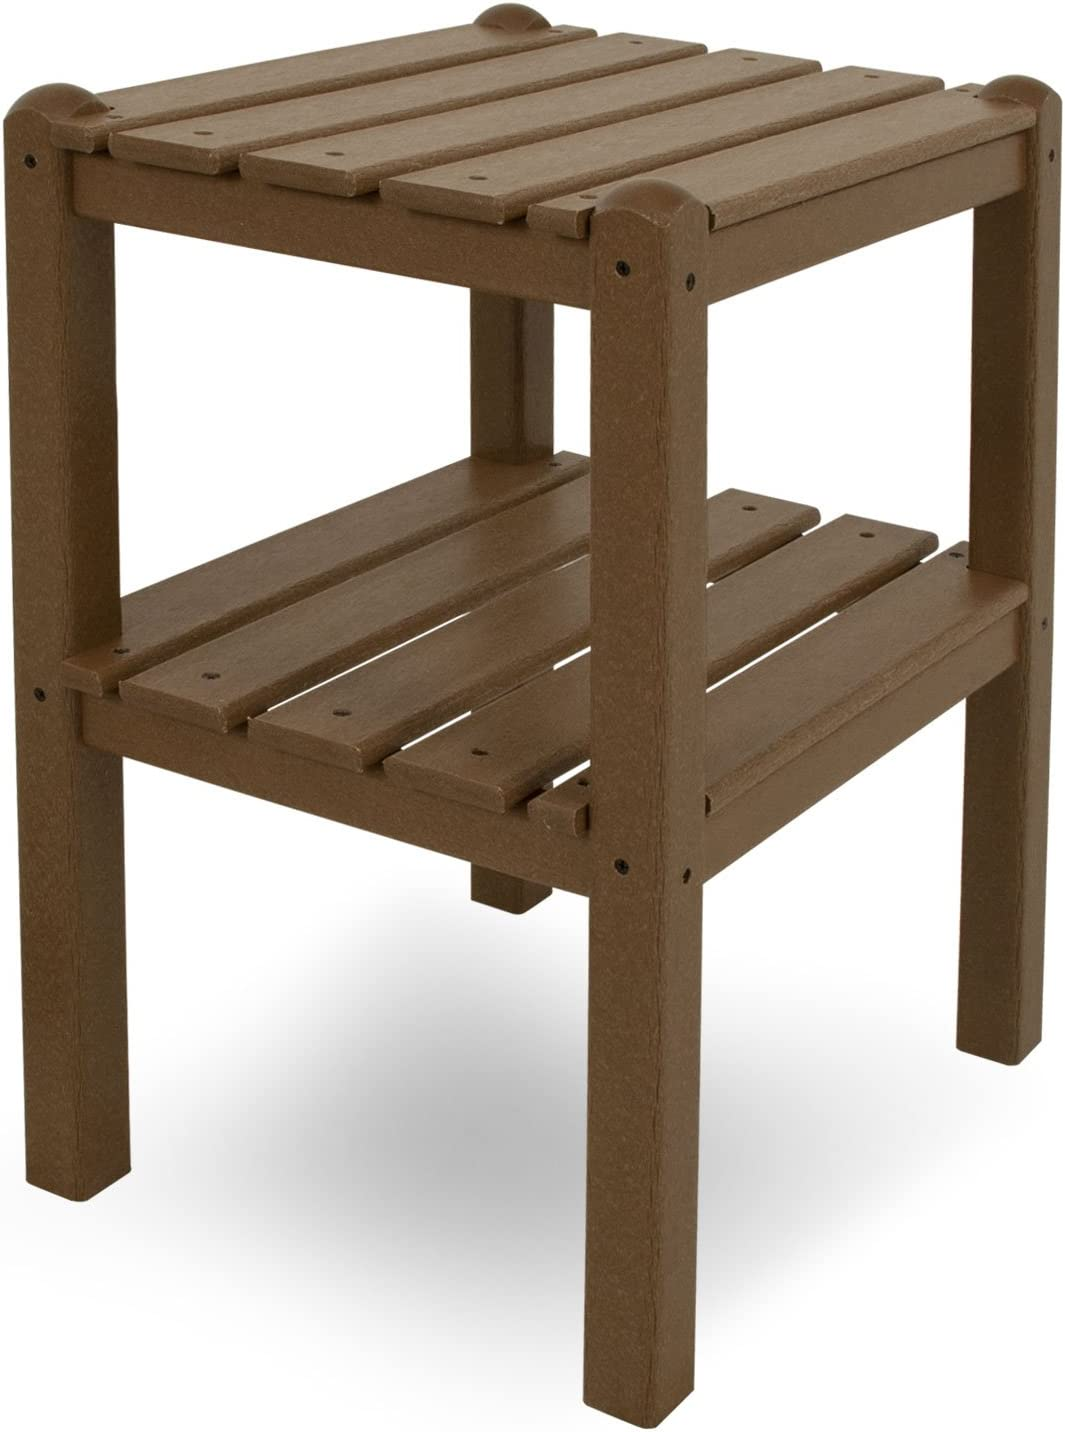 POLYWOOD TWSTTE Two Shelf Side Table, Teak